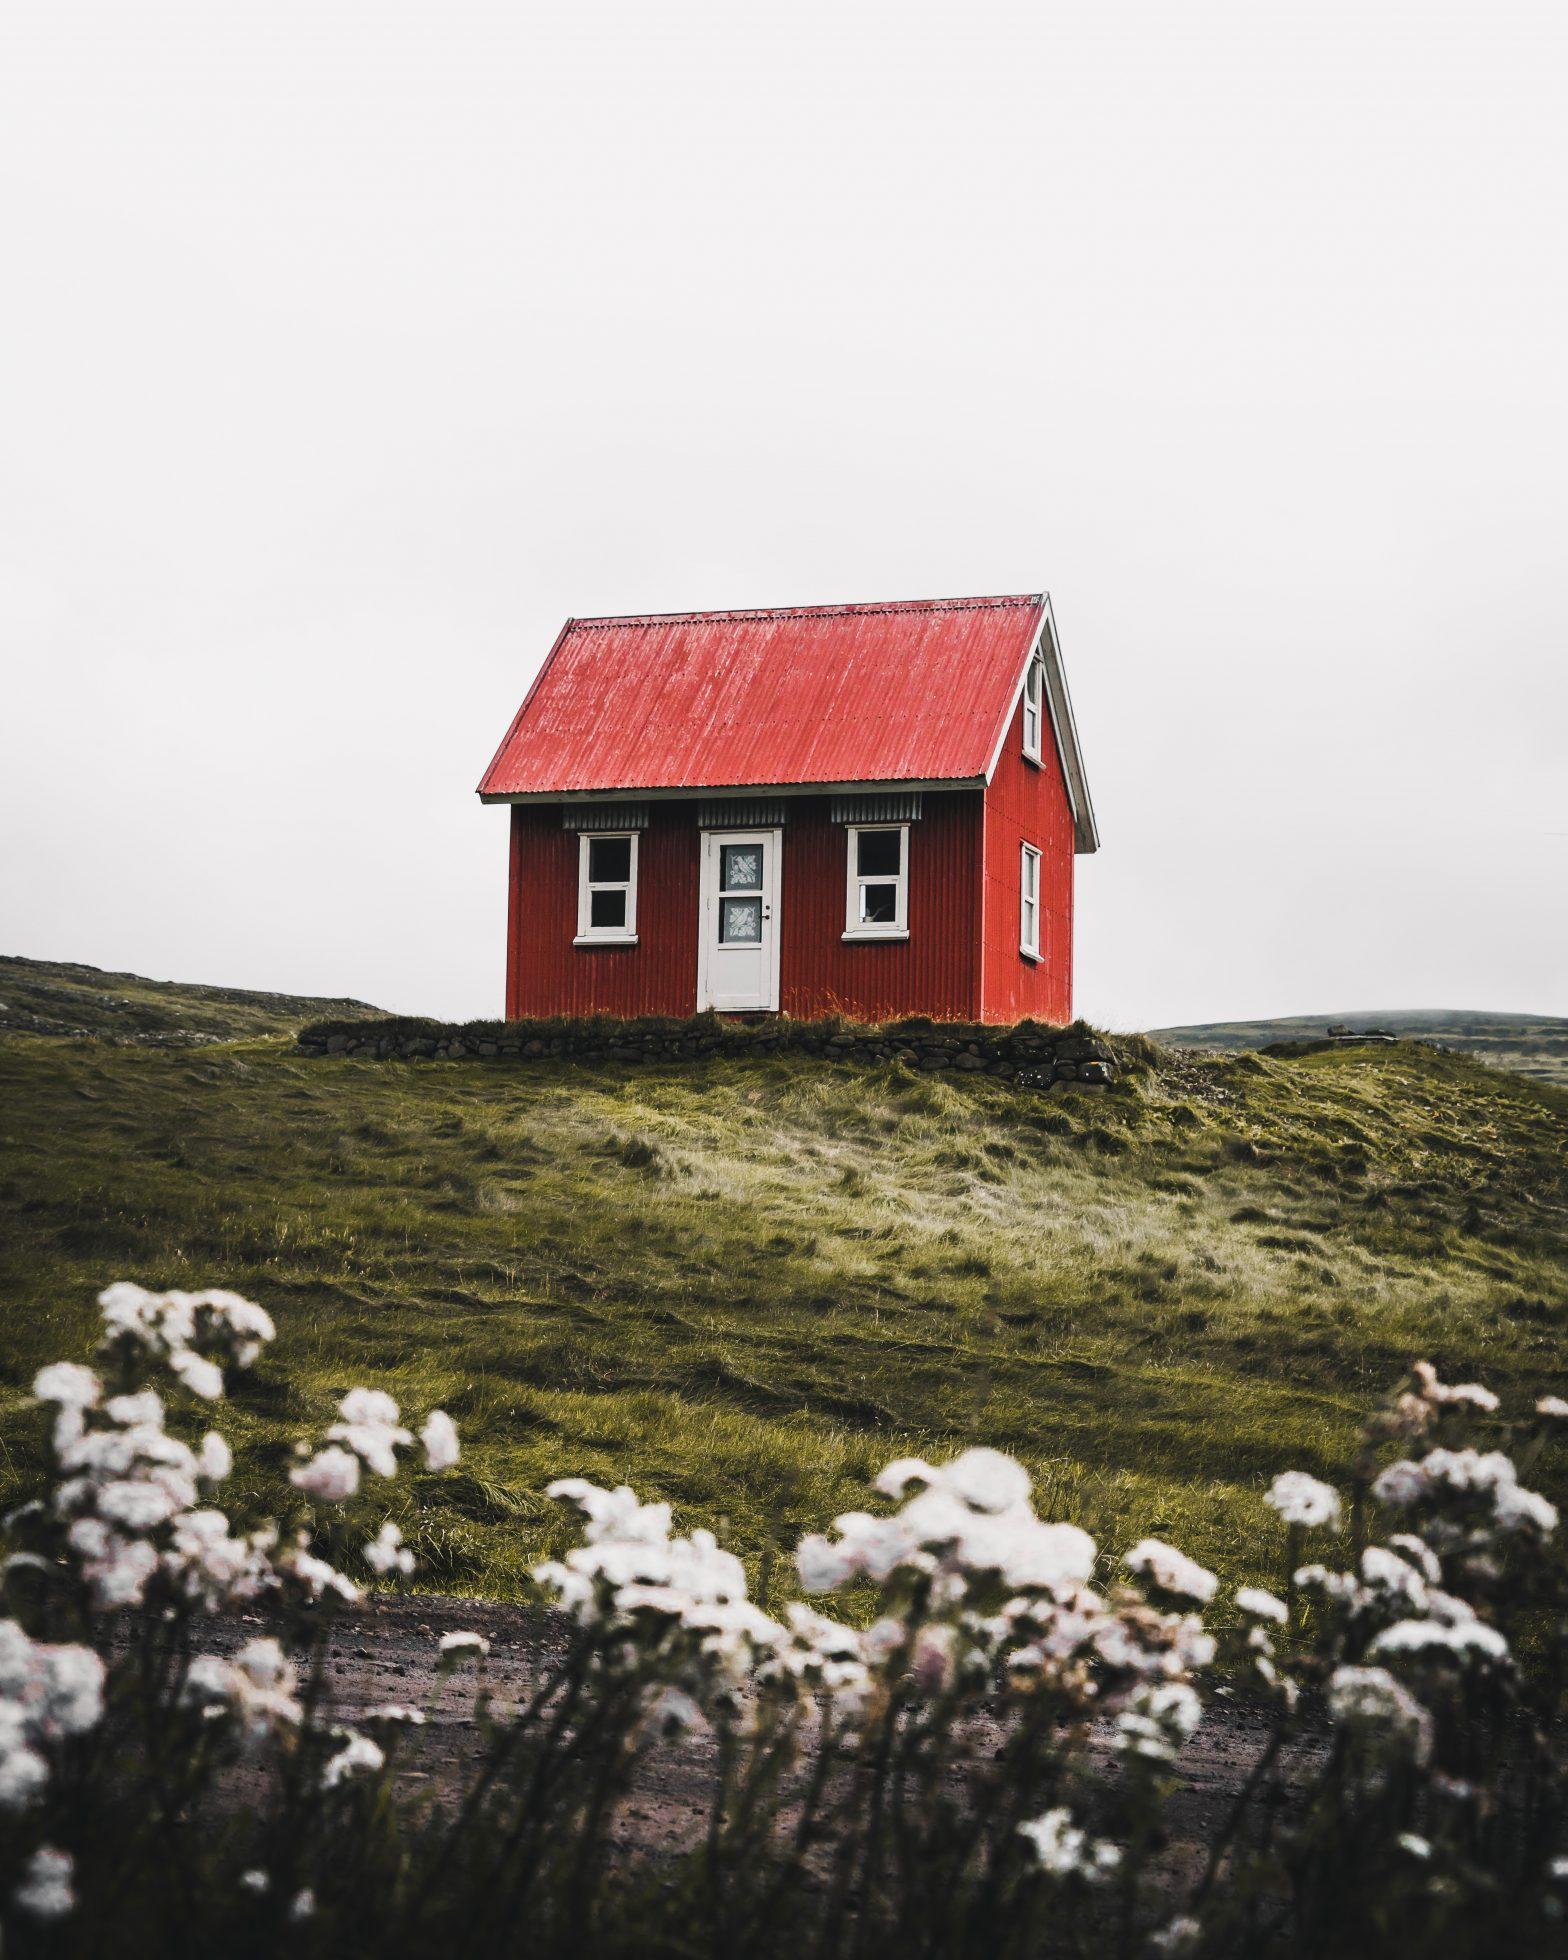 Sospensione rate mutuo casa